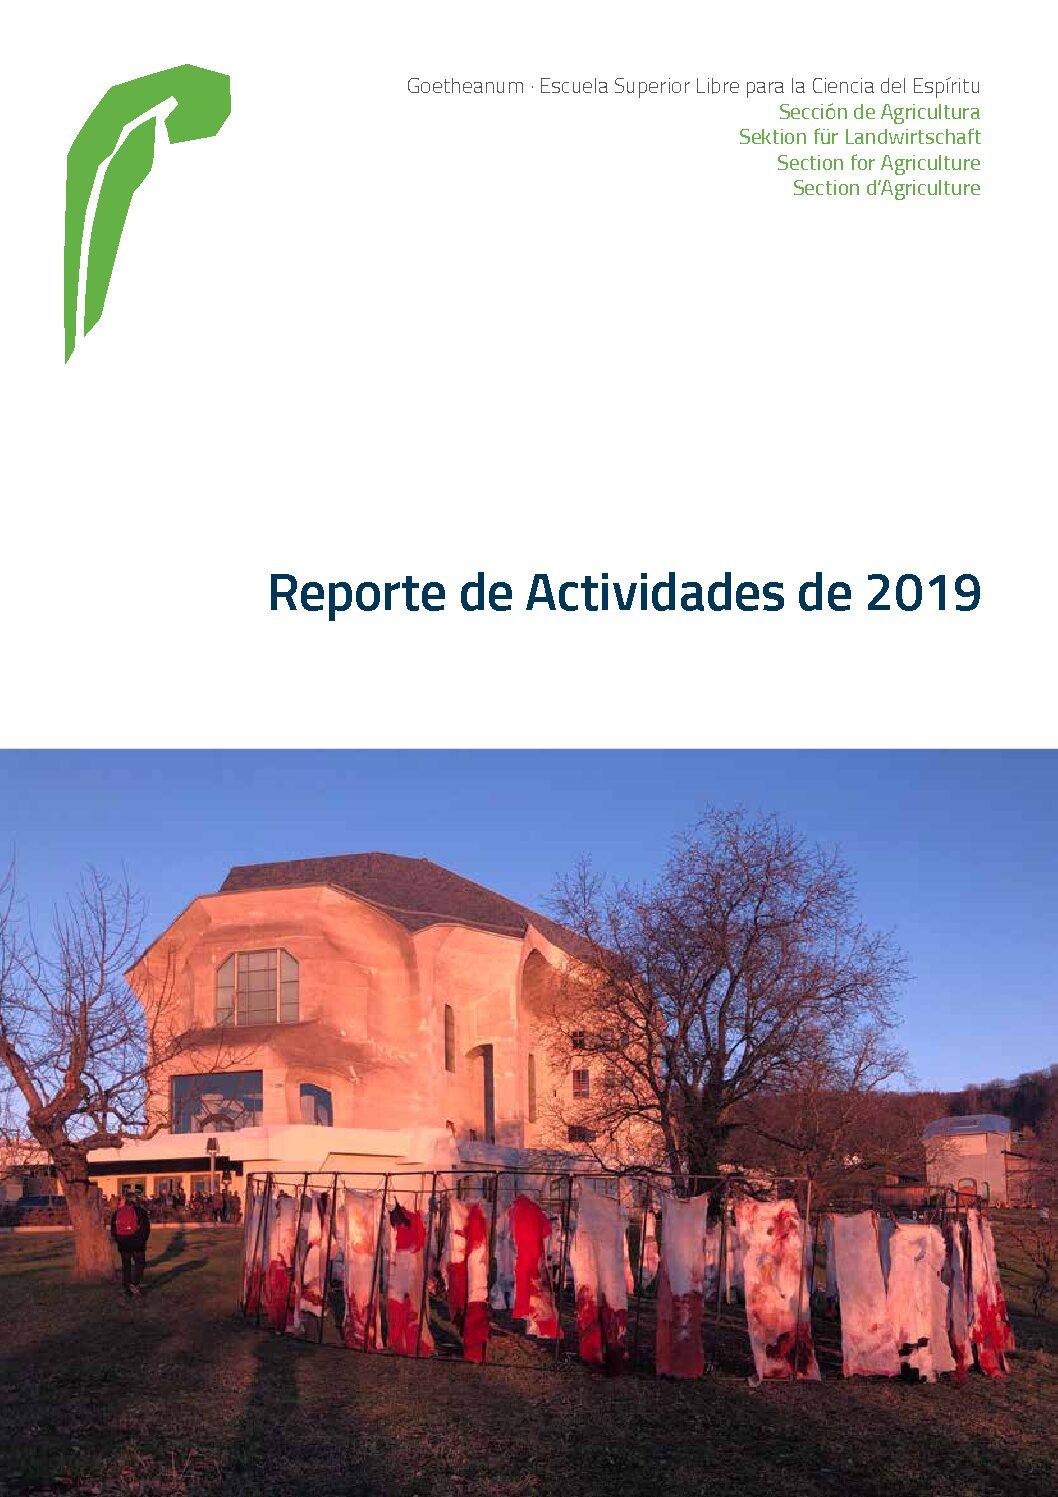 Reporte de actividades 2019